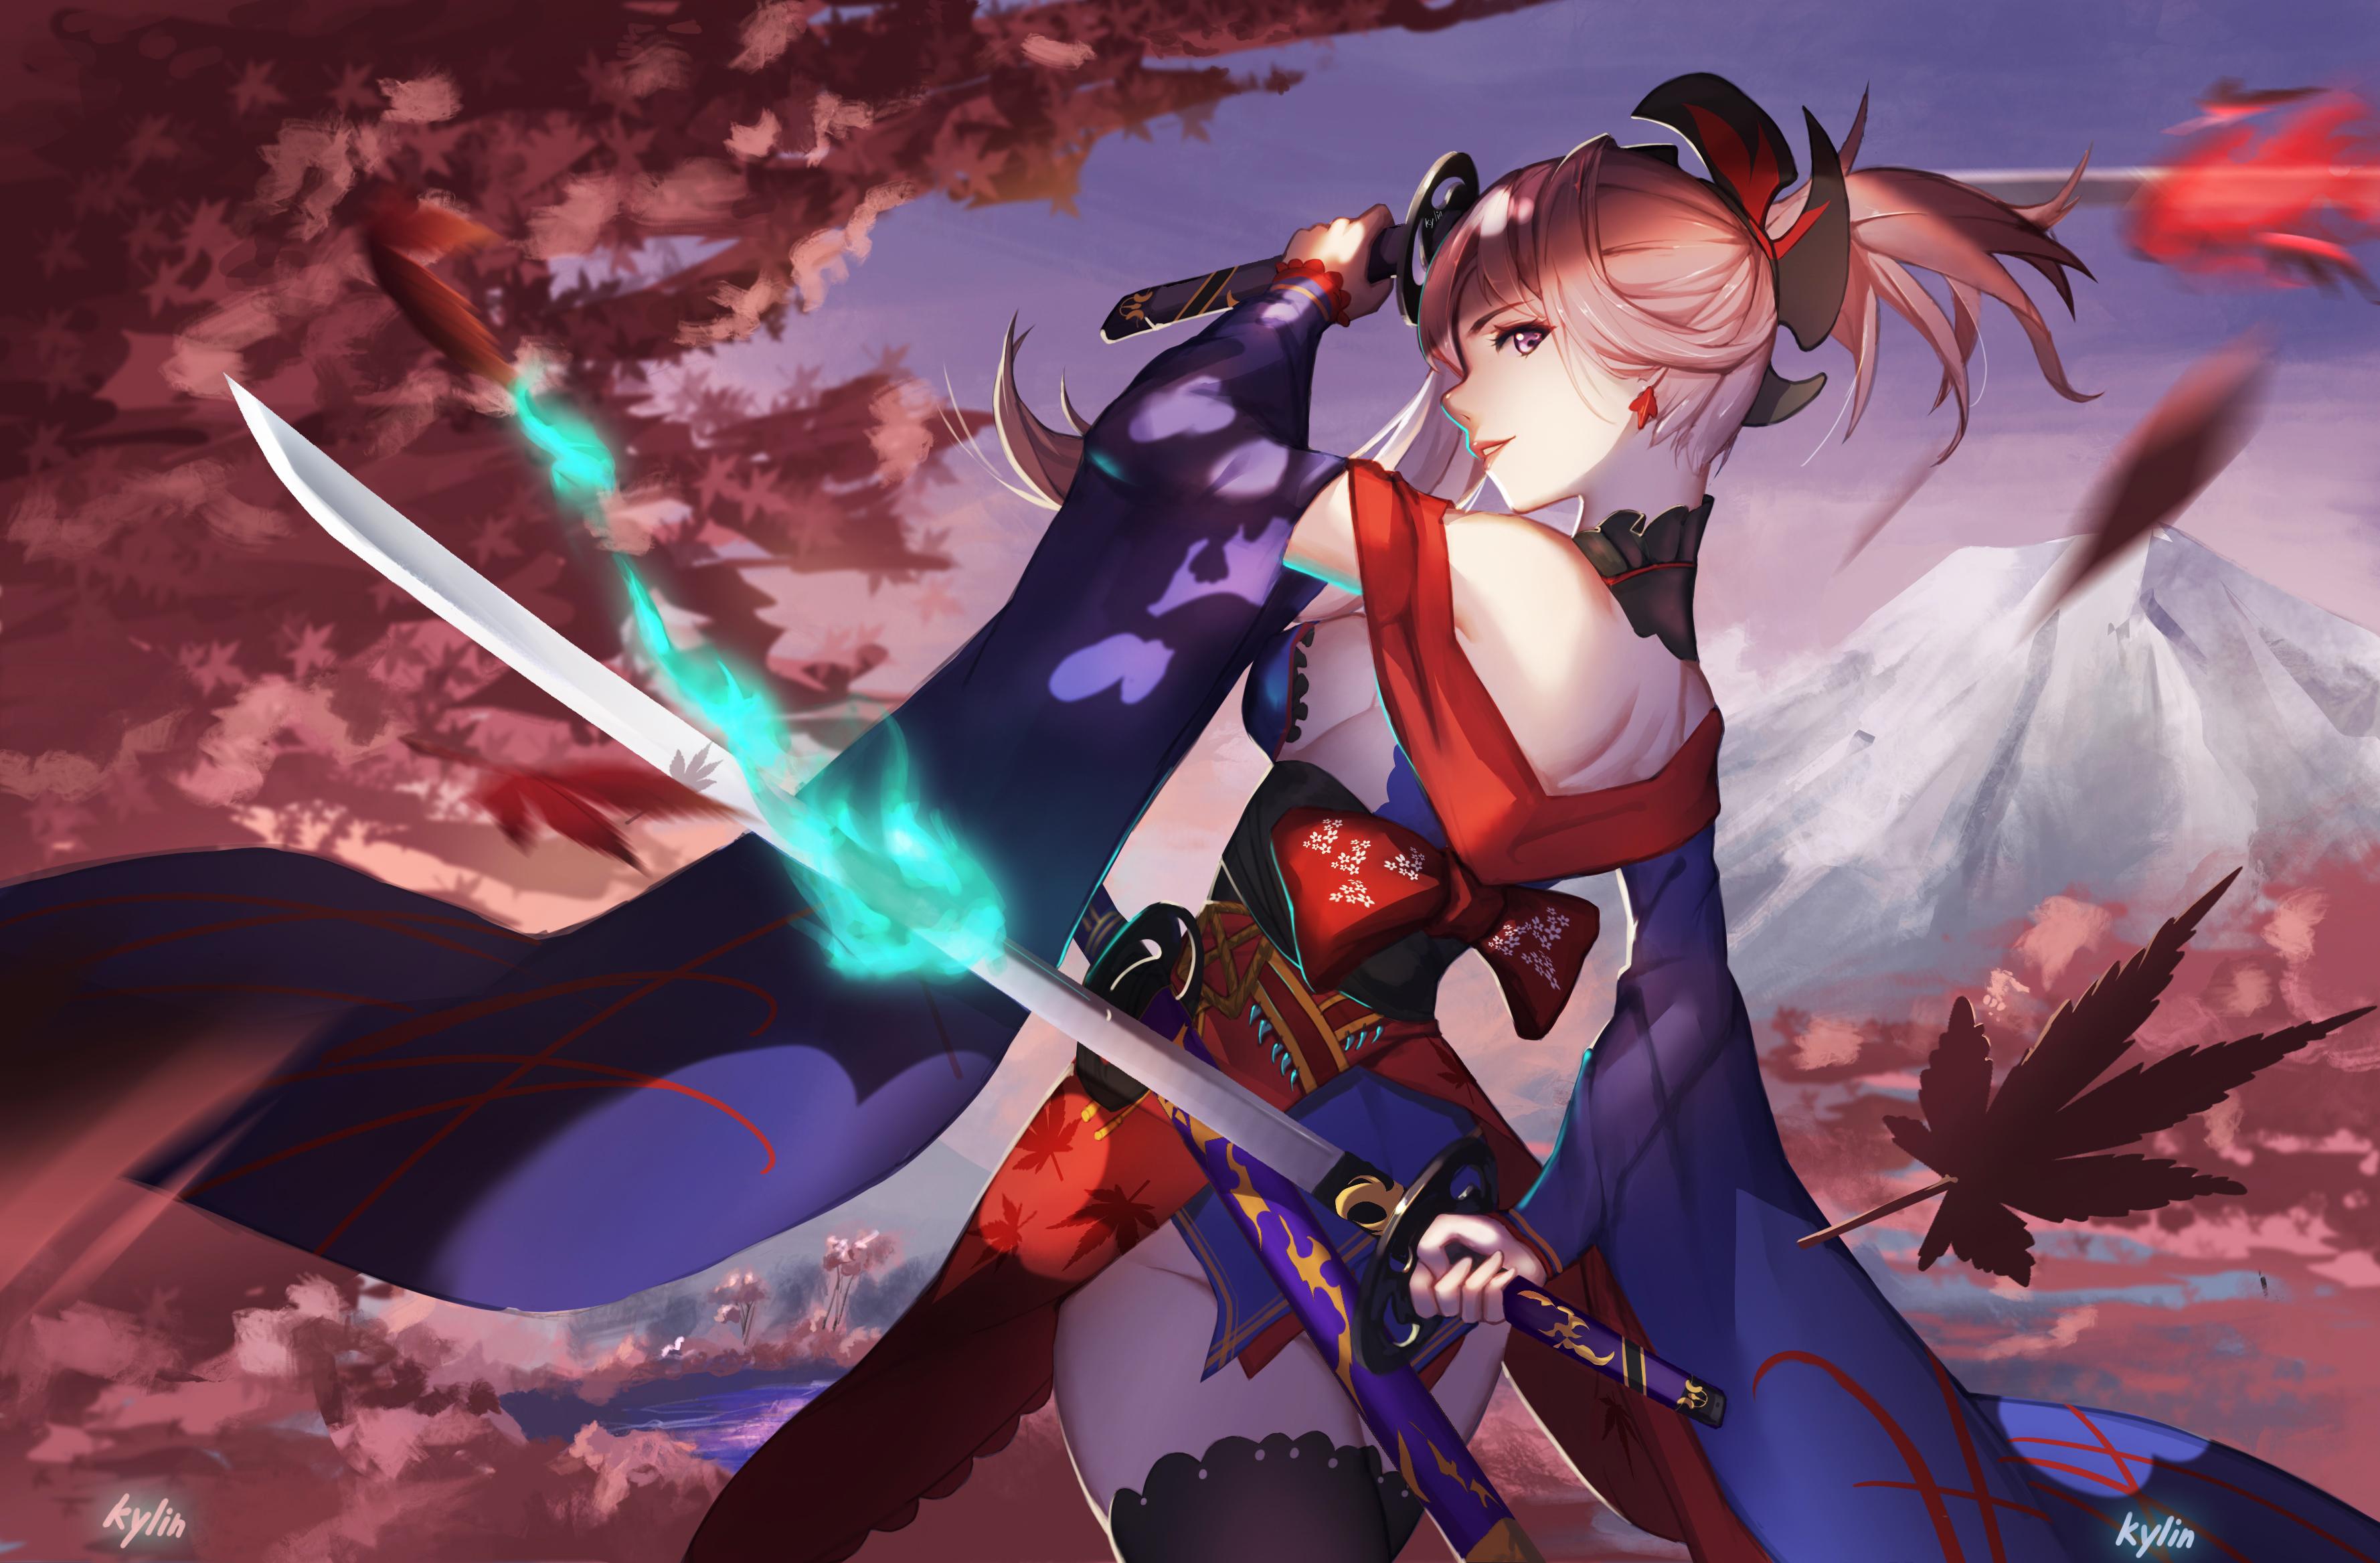 [F] Wicca Izanami __miyamoto_musashi_fate_grand_order_and_etc_drawn_by_yun_lin__252d81176c9d9dec1990bc1b88169f06